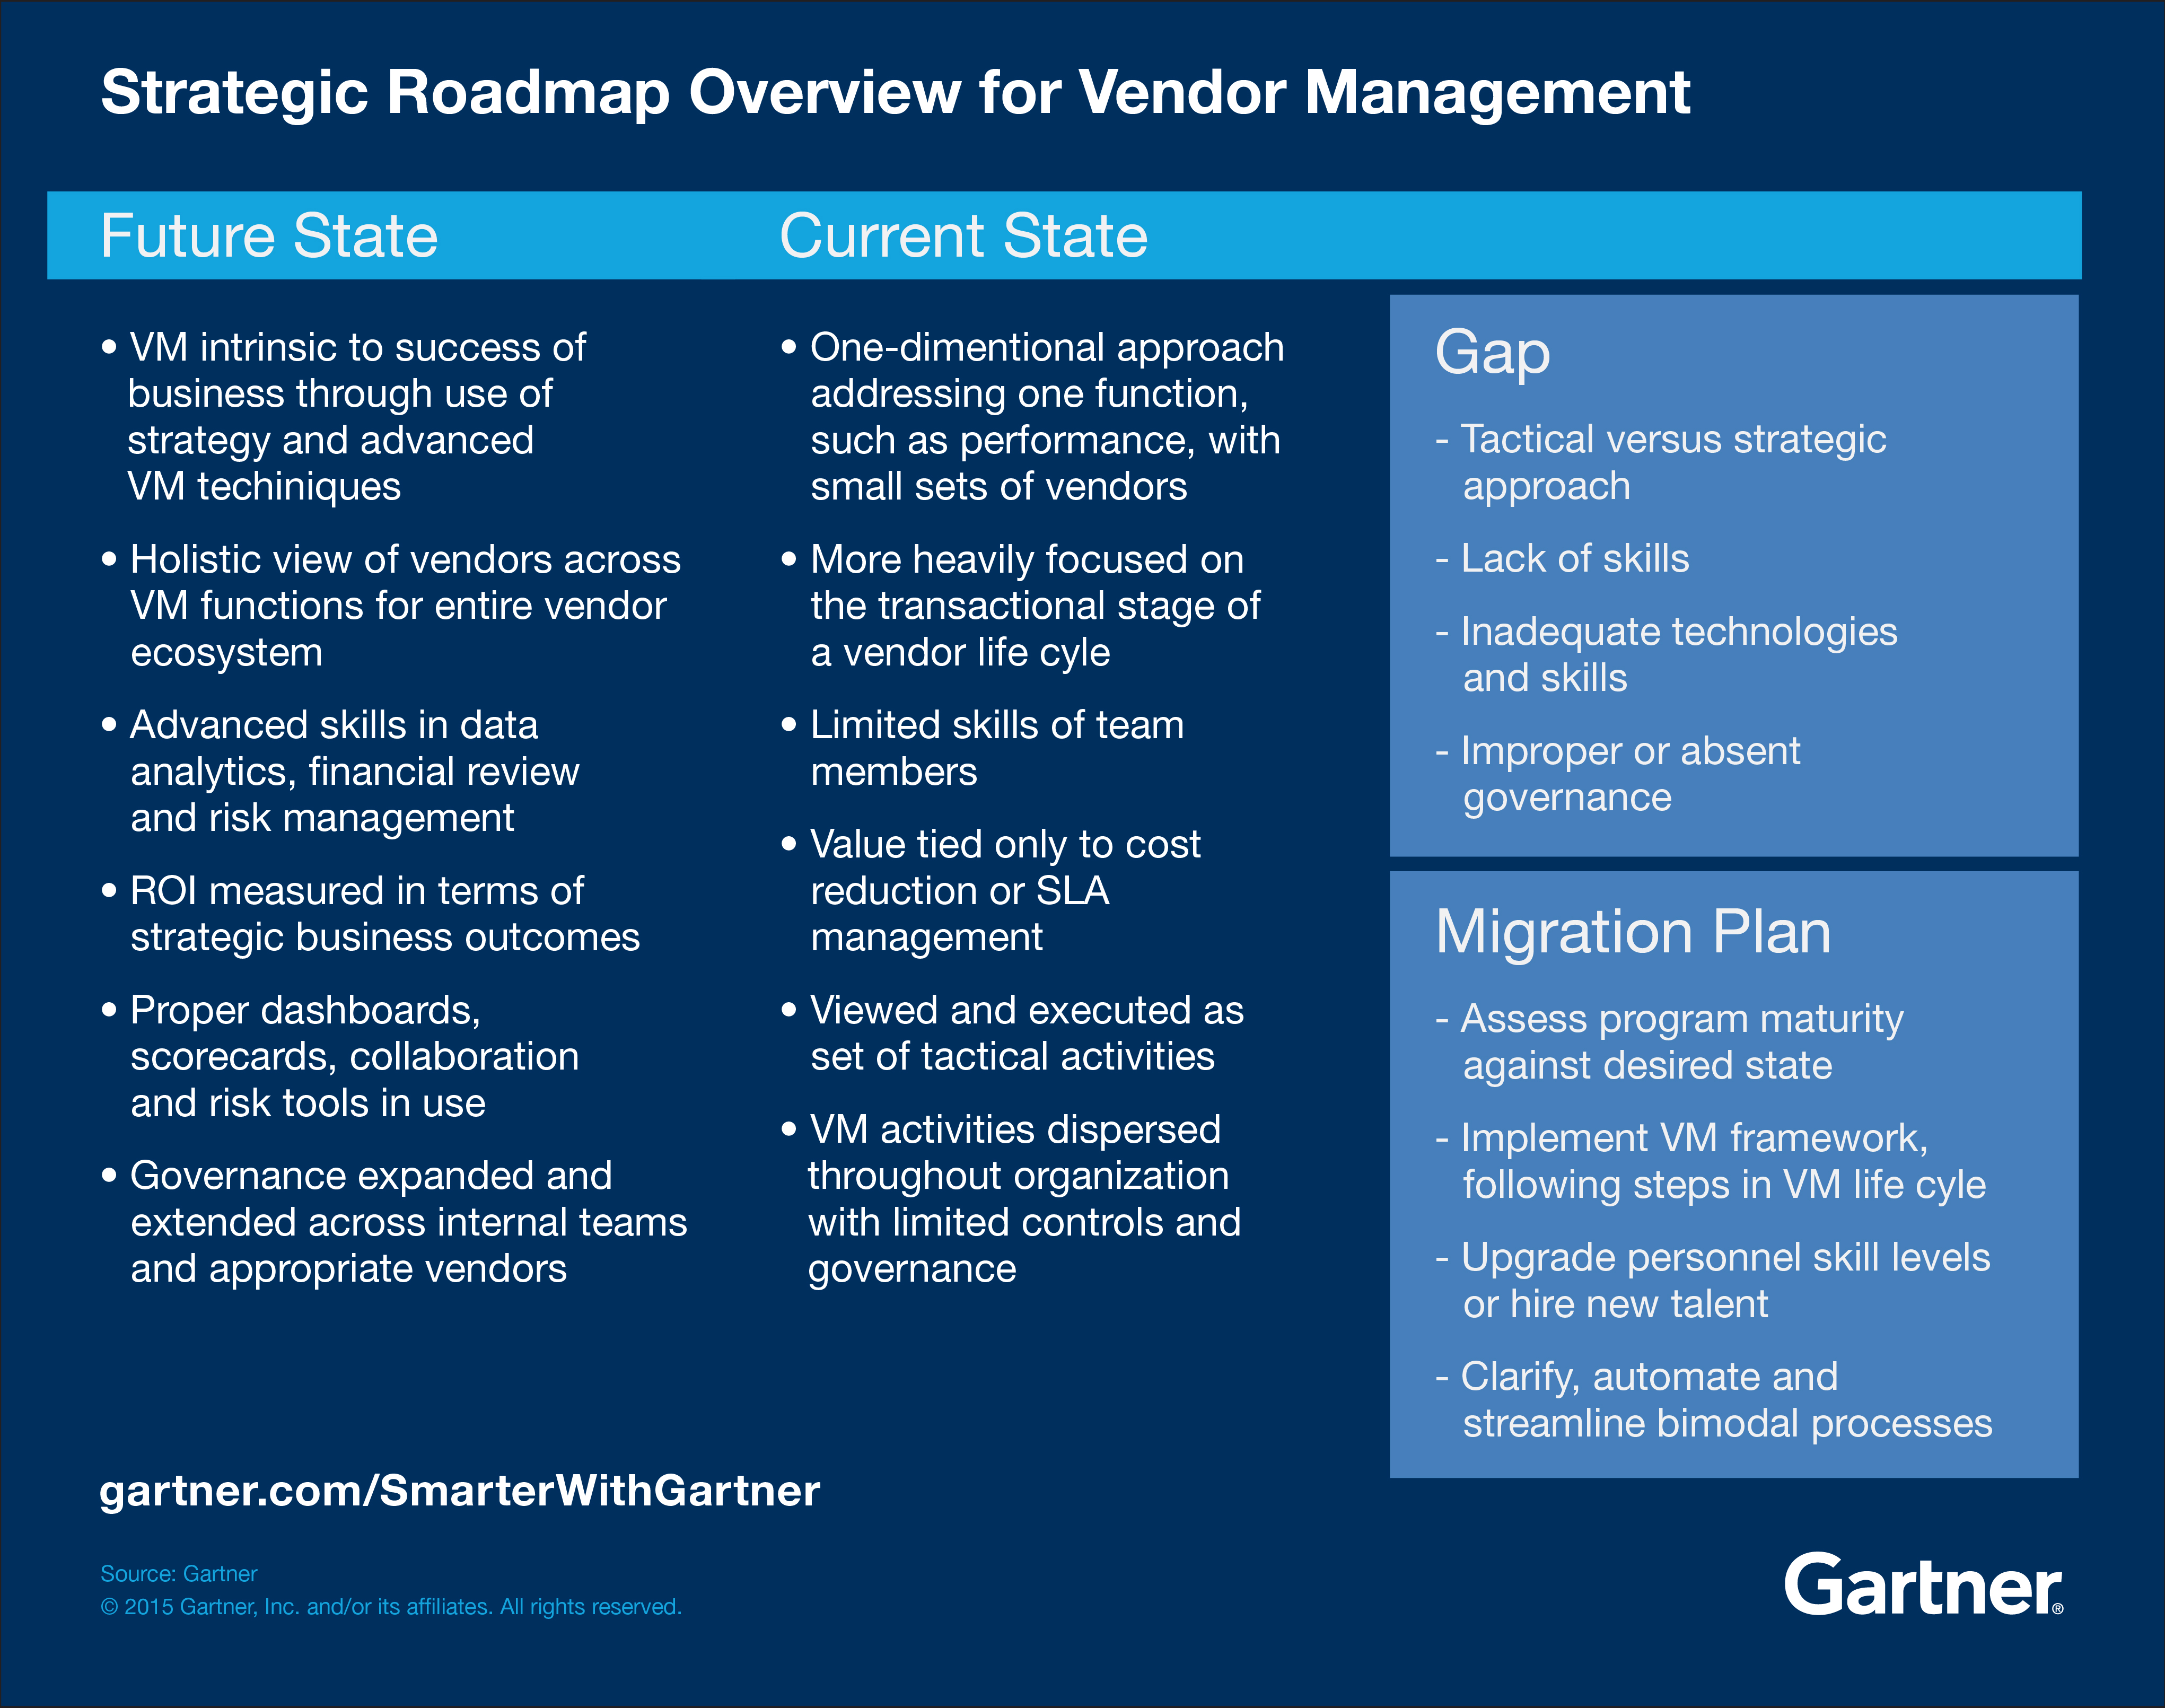 Strategic Roadmap Overview for Vendor Management